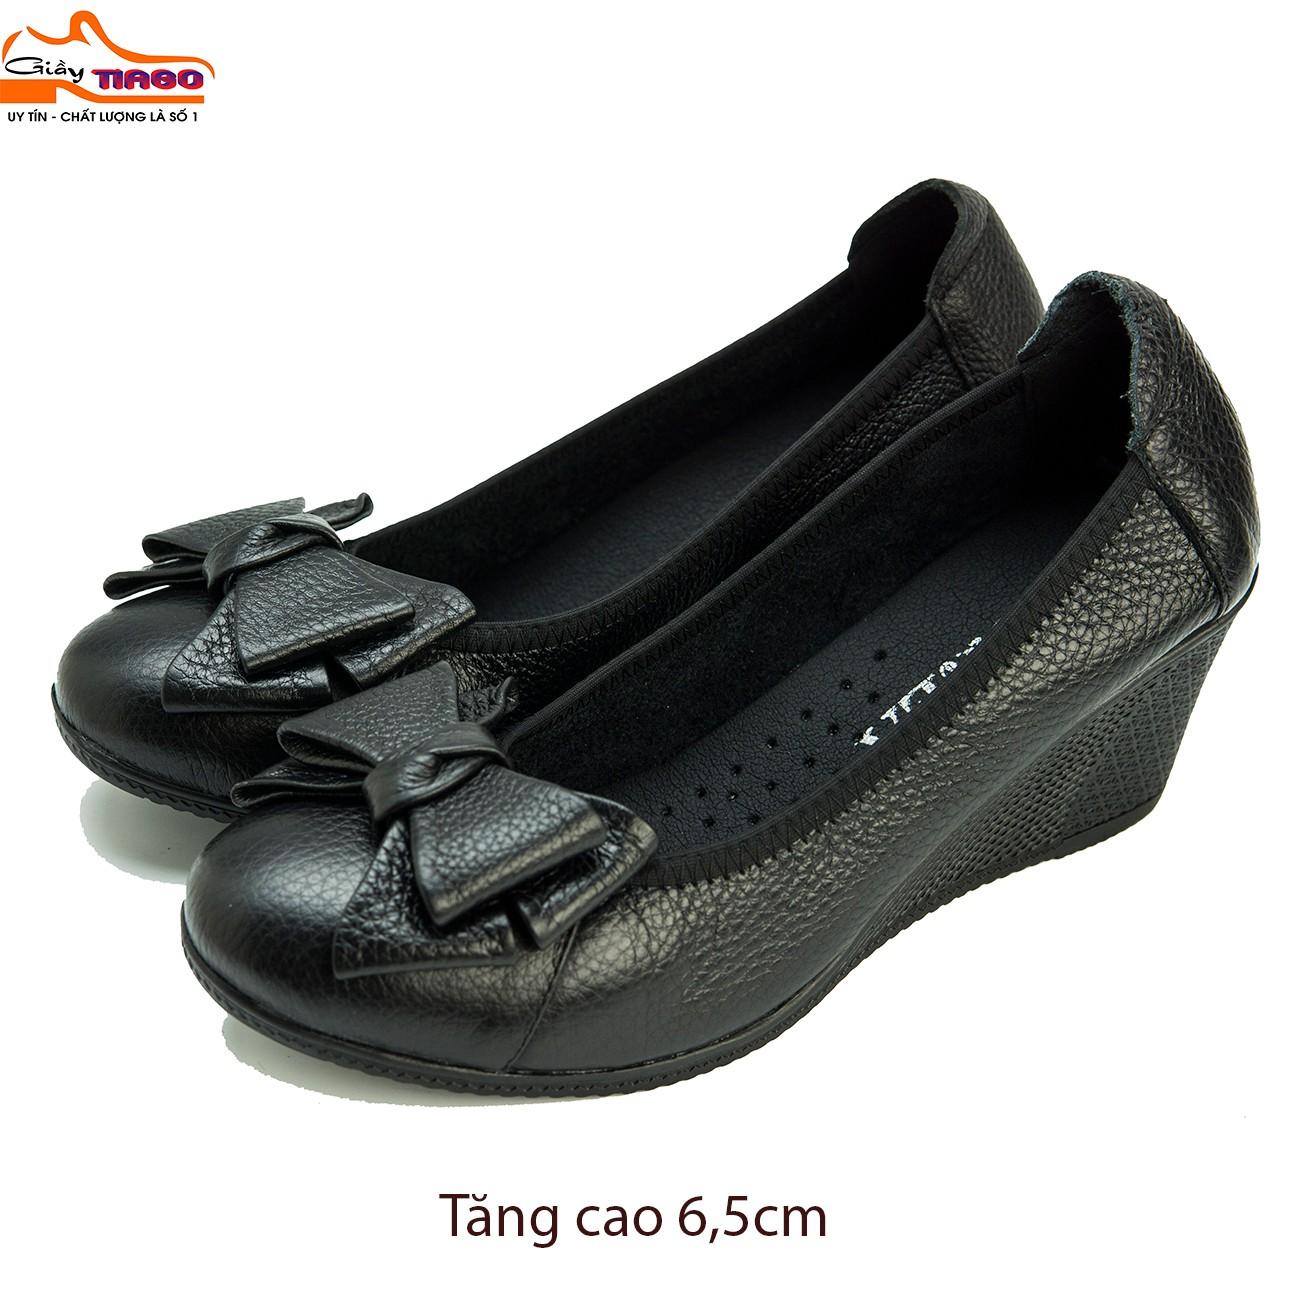 Giày nữ da bò - giày nữ da bò